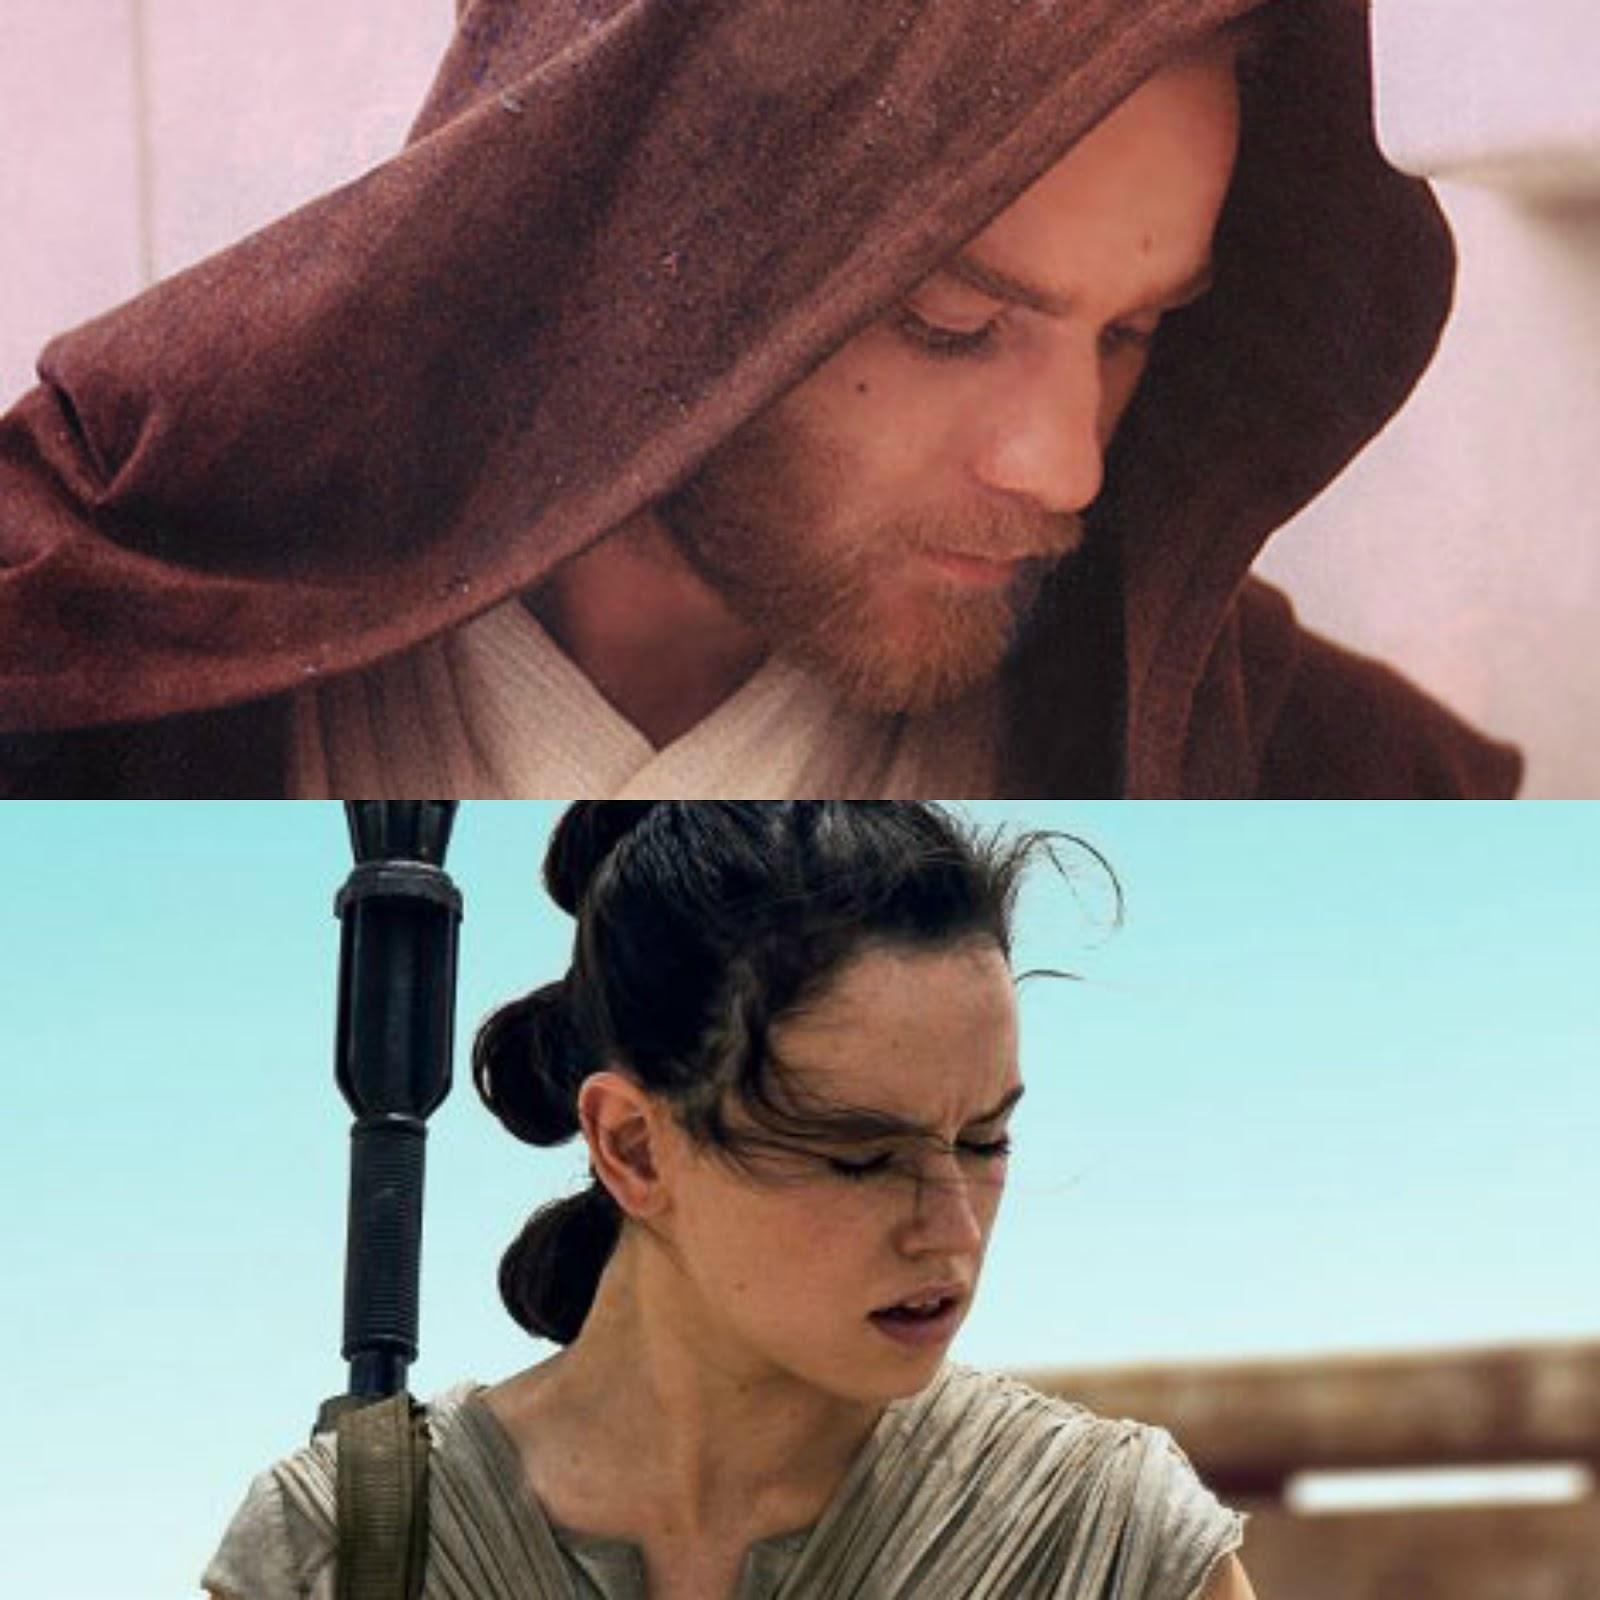 Rey Kenobi